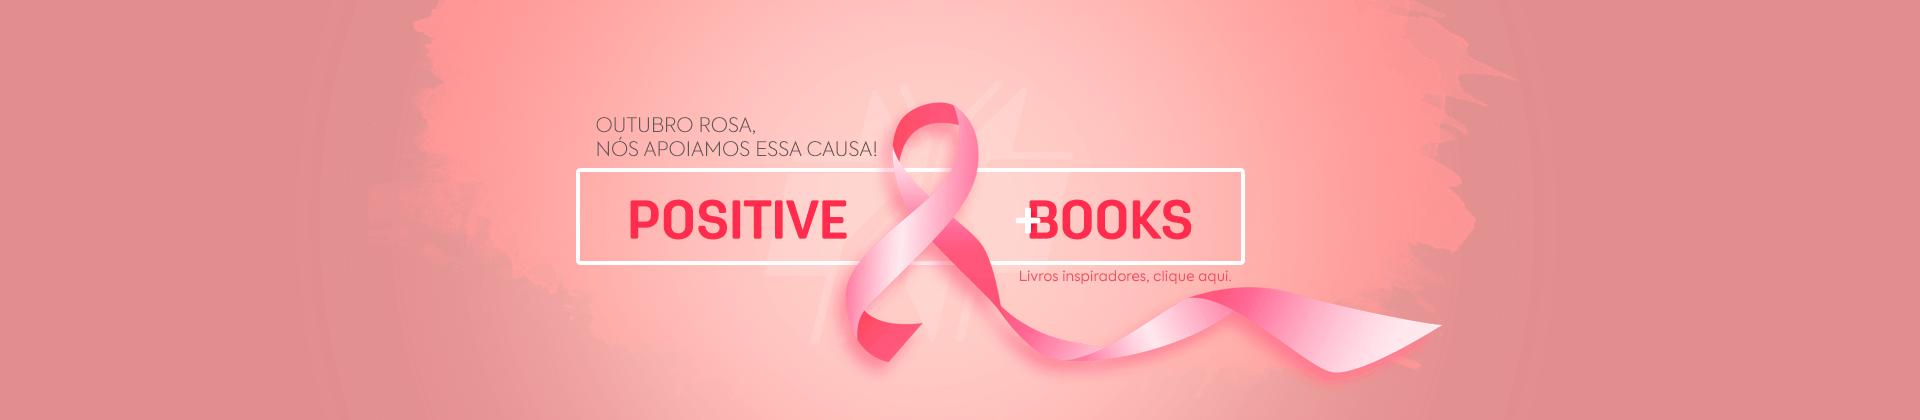 Positive Books